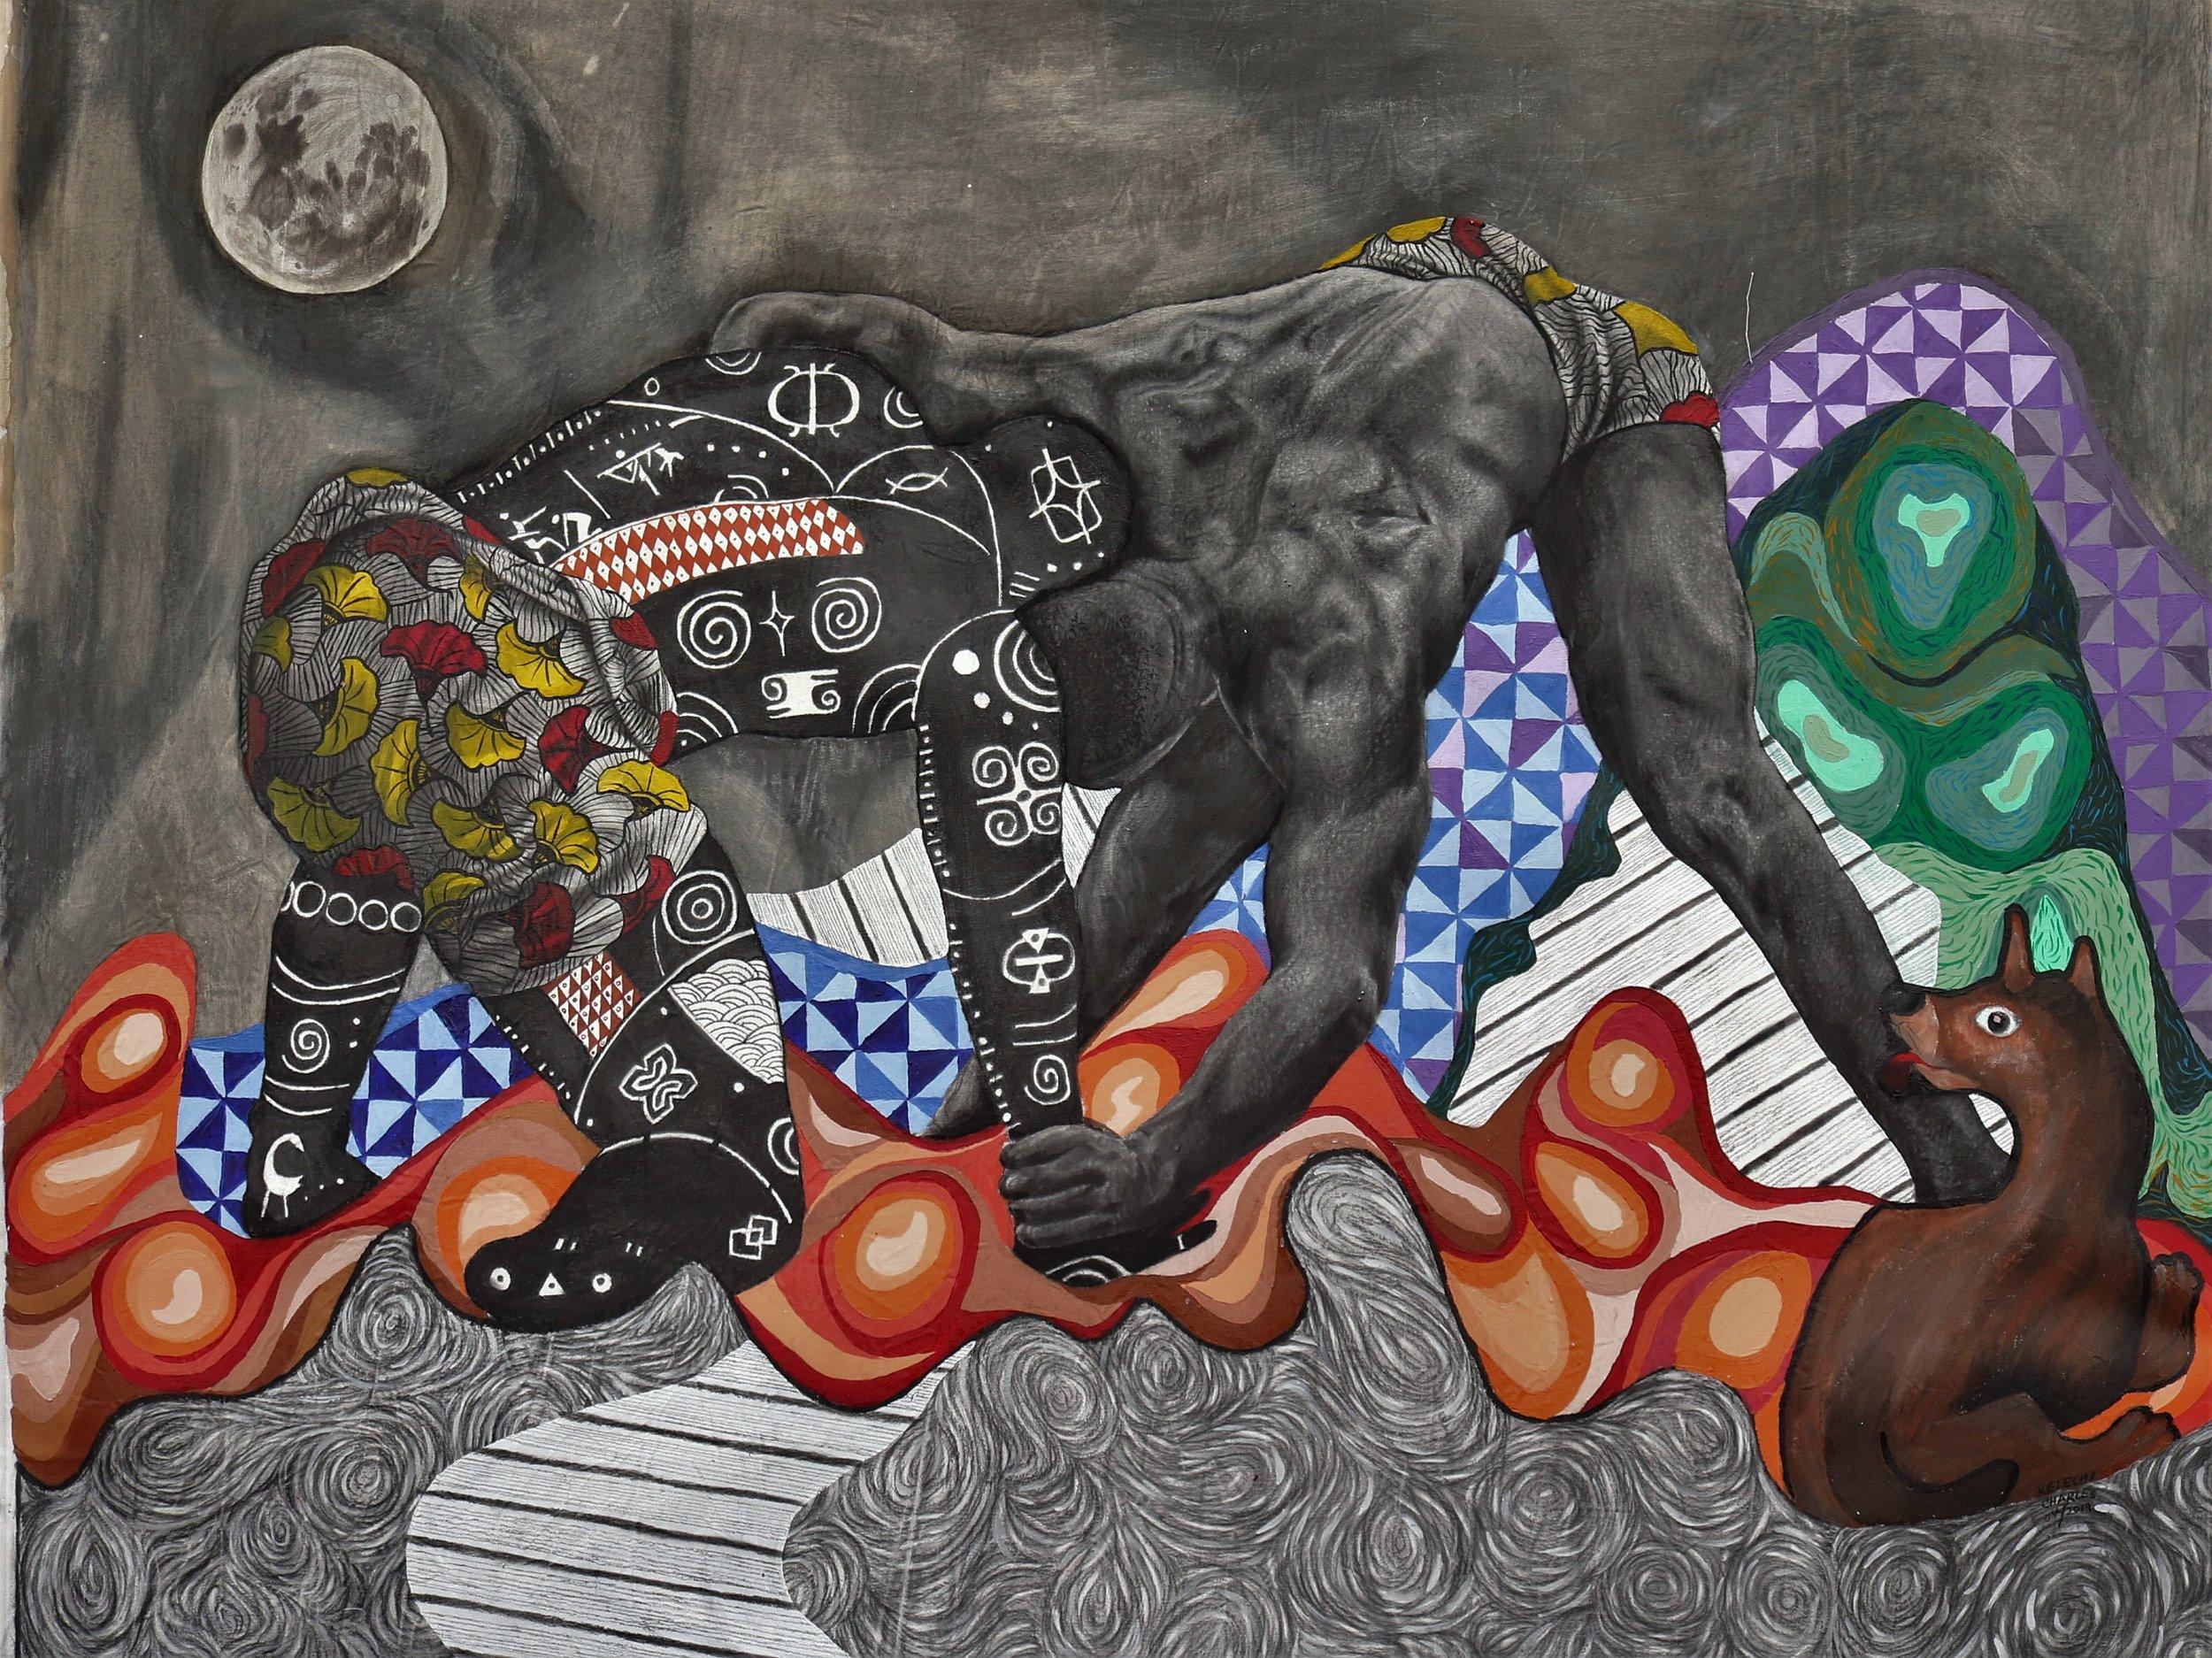 Battle Within, Battle Within, Acrylic, charcoal, pencil, watercolour on canvas, 145 x 162 cm, 2019, Kelechi Nwaneri